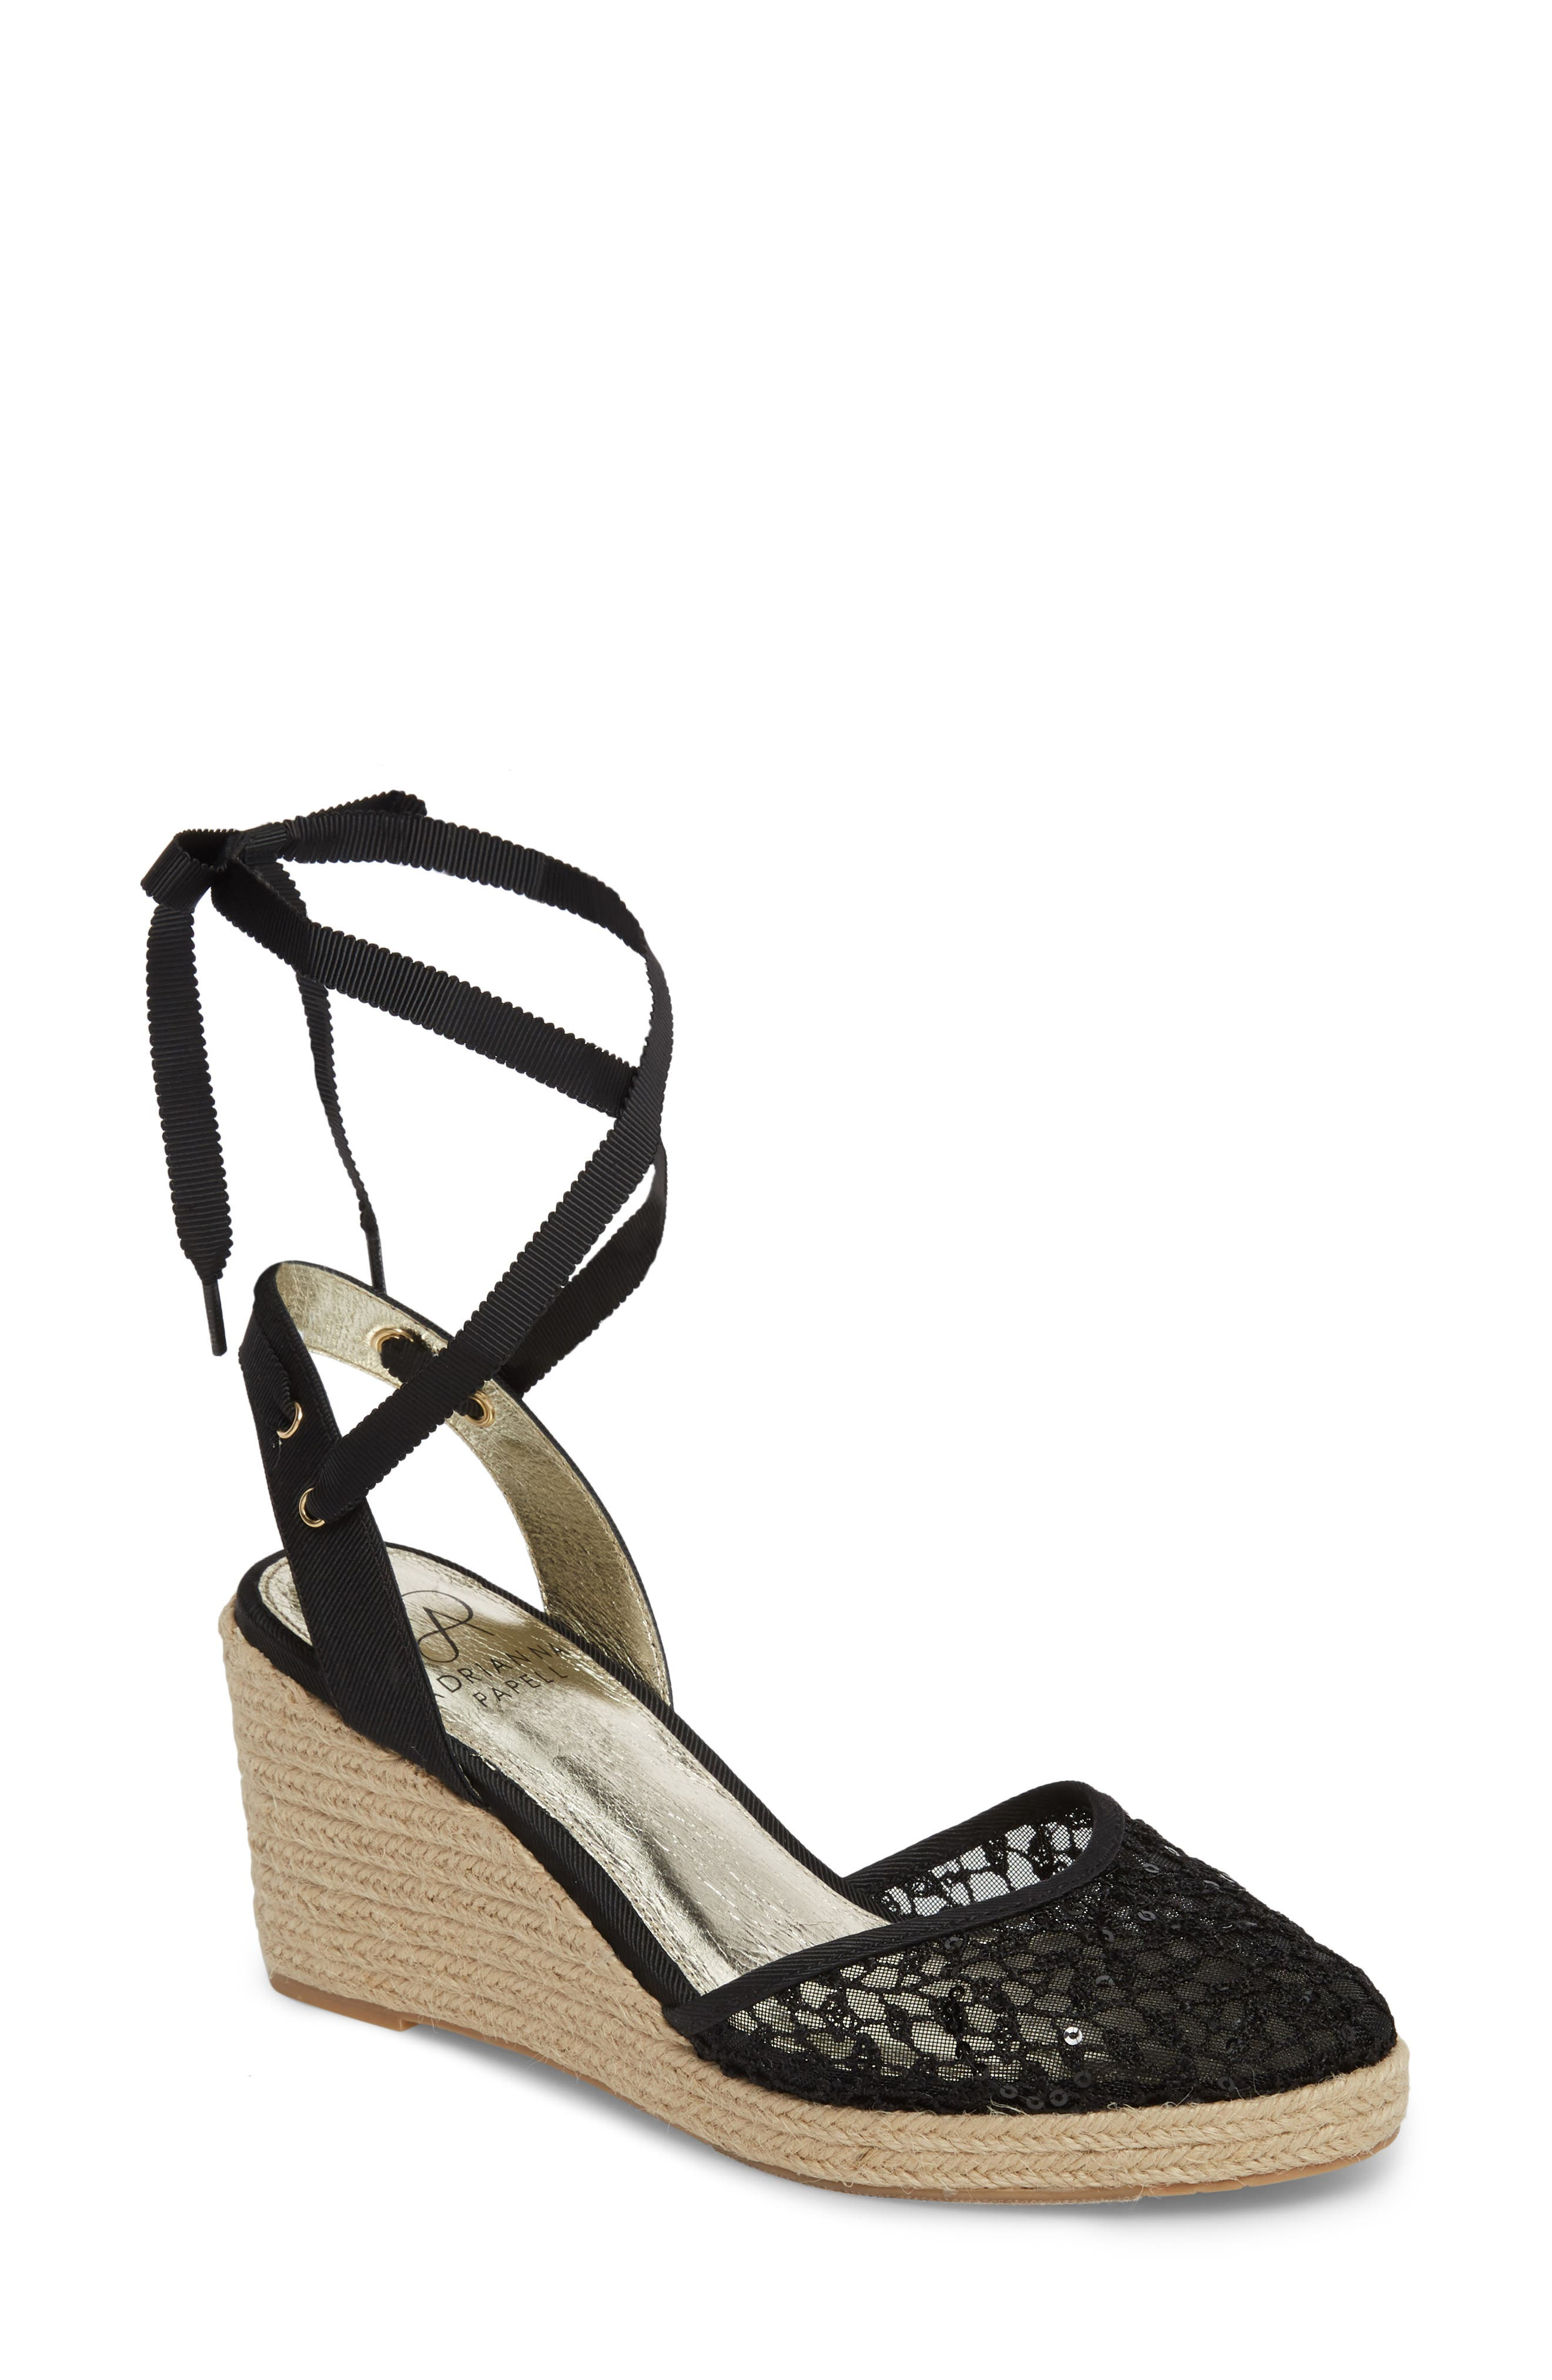 ADRIANNA PAPELL, Pamela Espadrille Wedge Sandal, Main thumbnail 1, color, BLACK LACE FABRIC